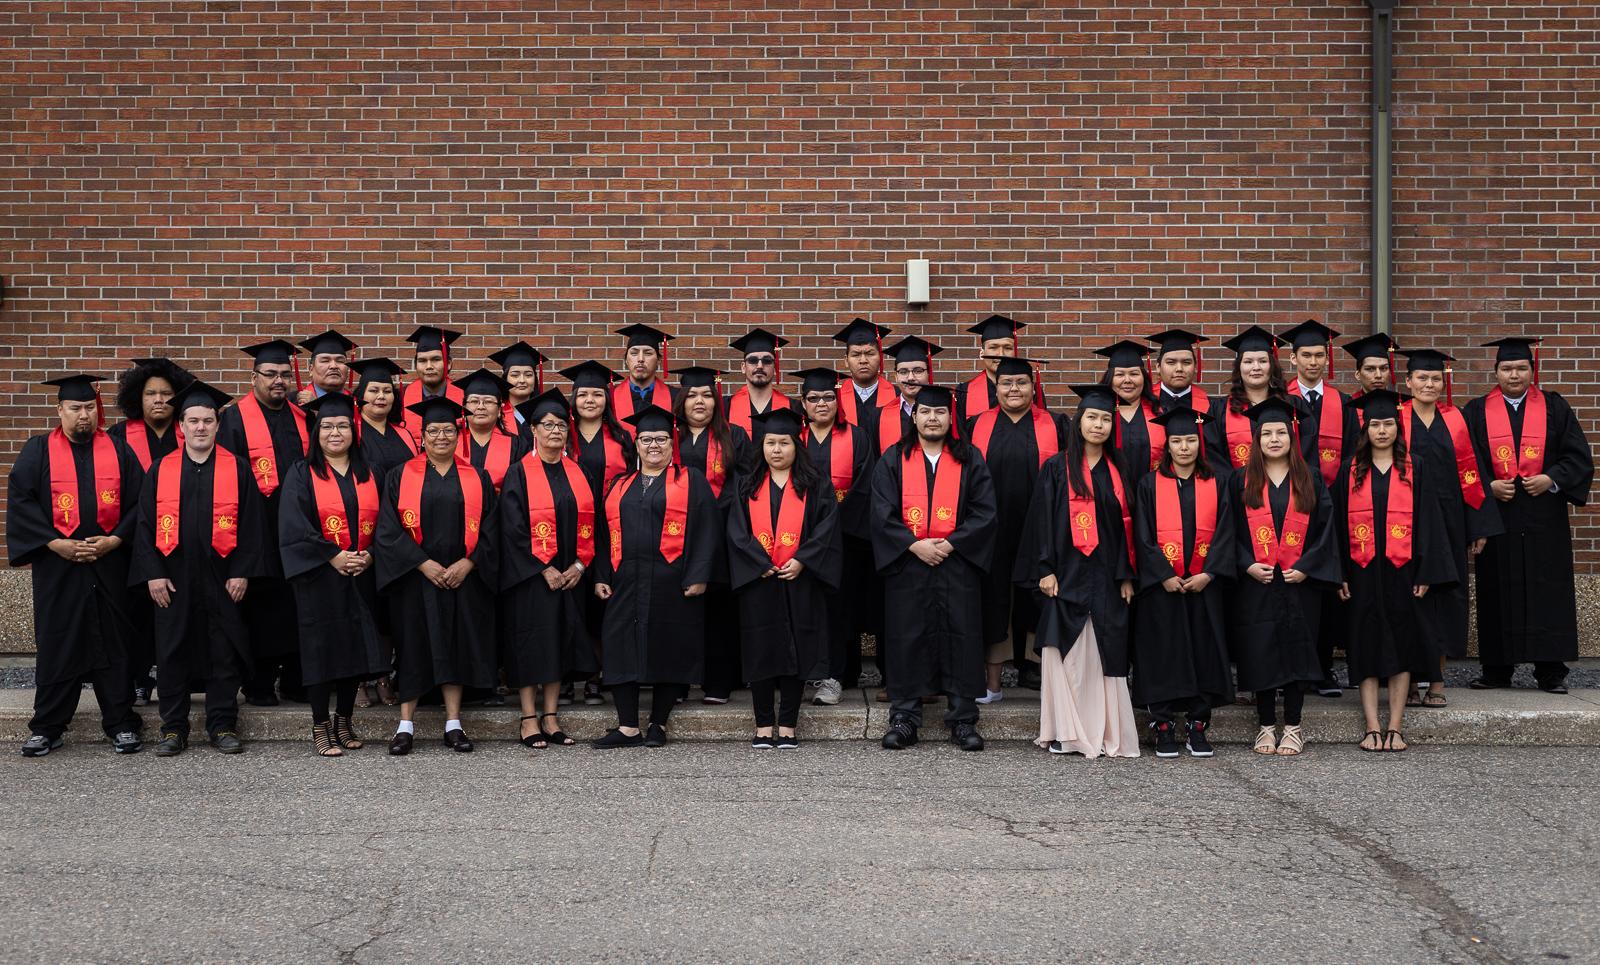 kihs-graduation-2019-fb-9.jpg